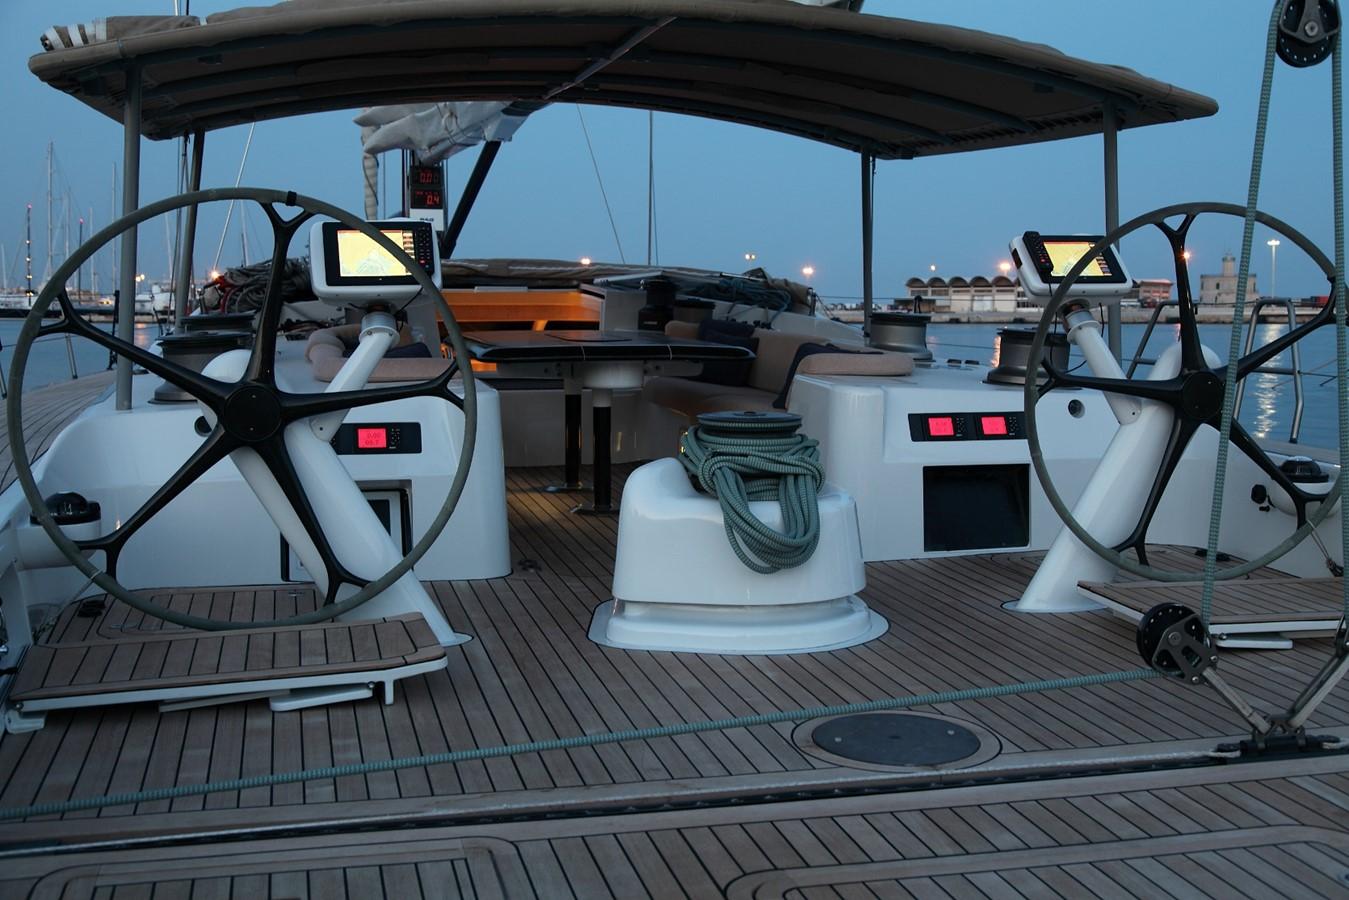 2000 GREEN MARINE, U.K. Super Maxi Fast Cruiser Cruising Sailboat 874040